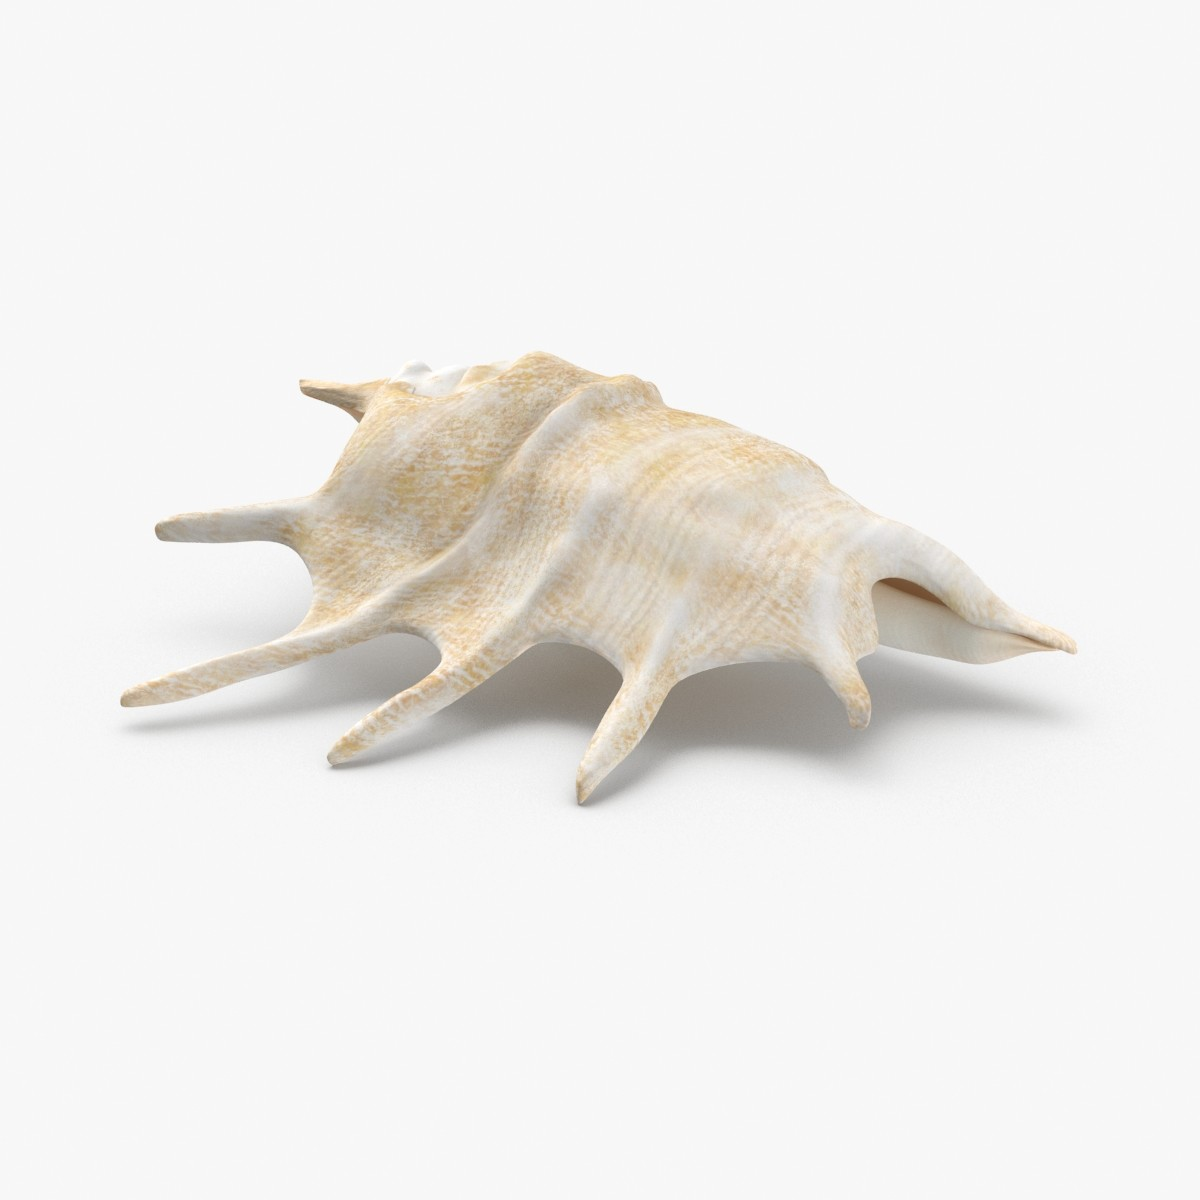 conch-shells---shell-01 3D model